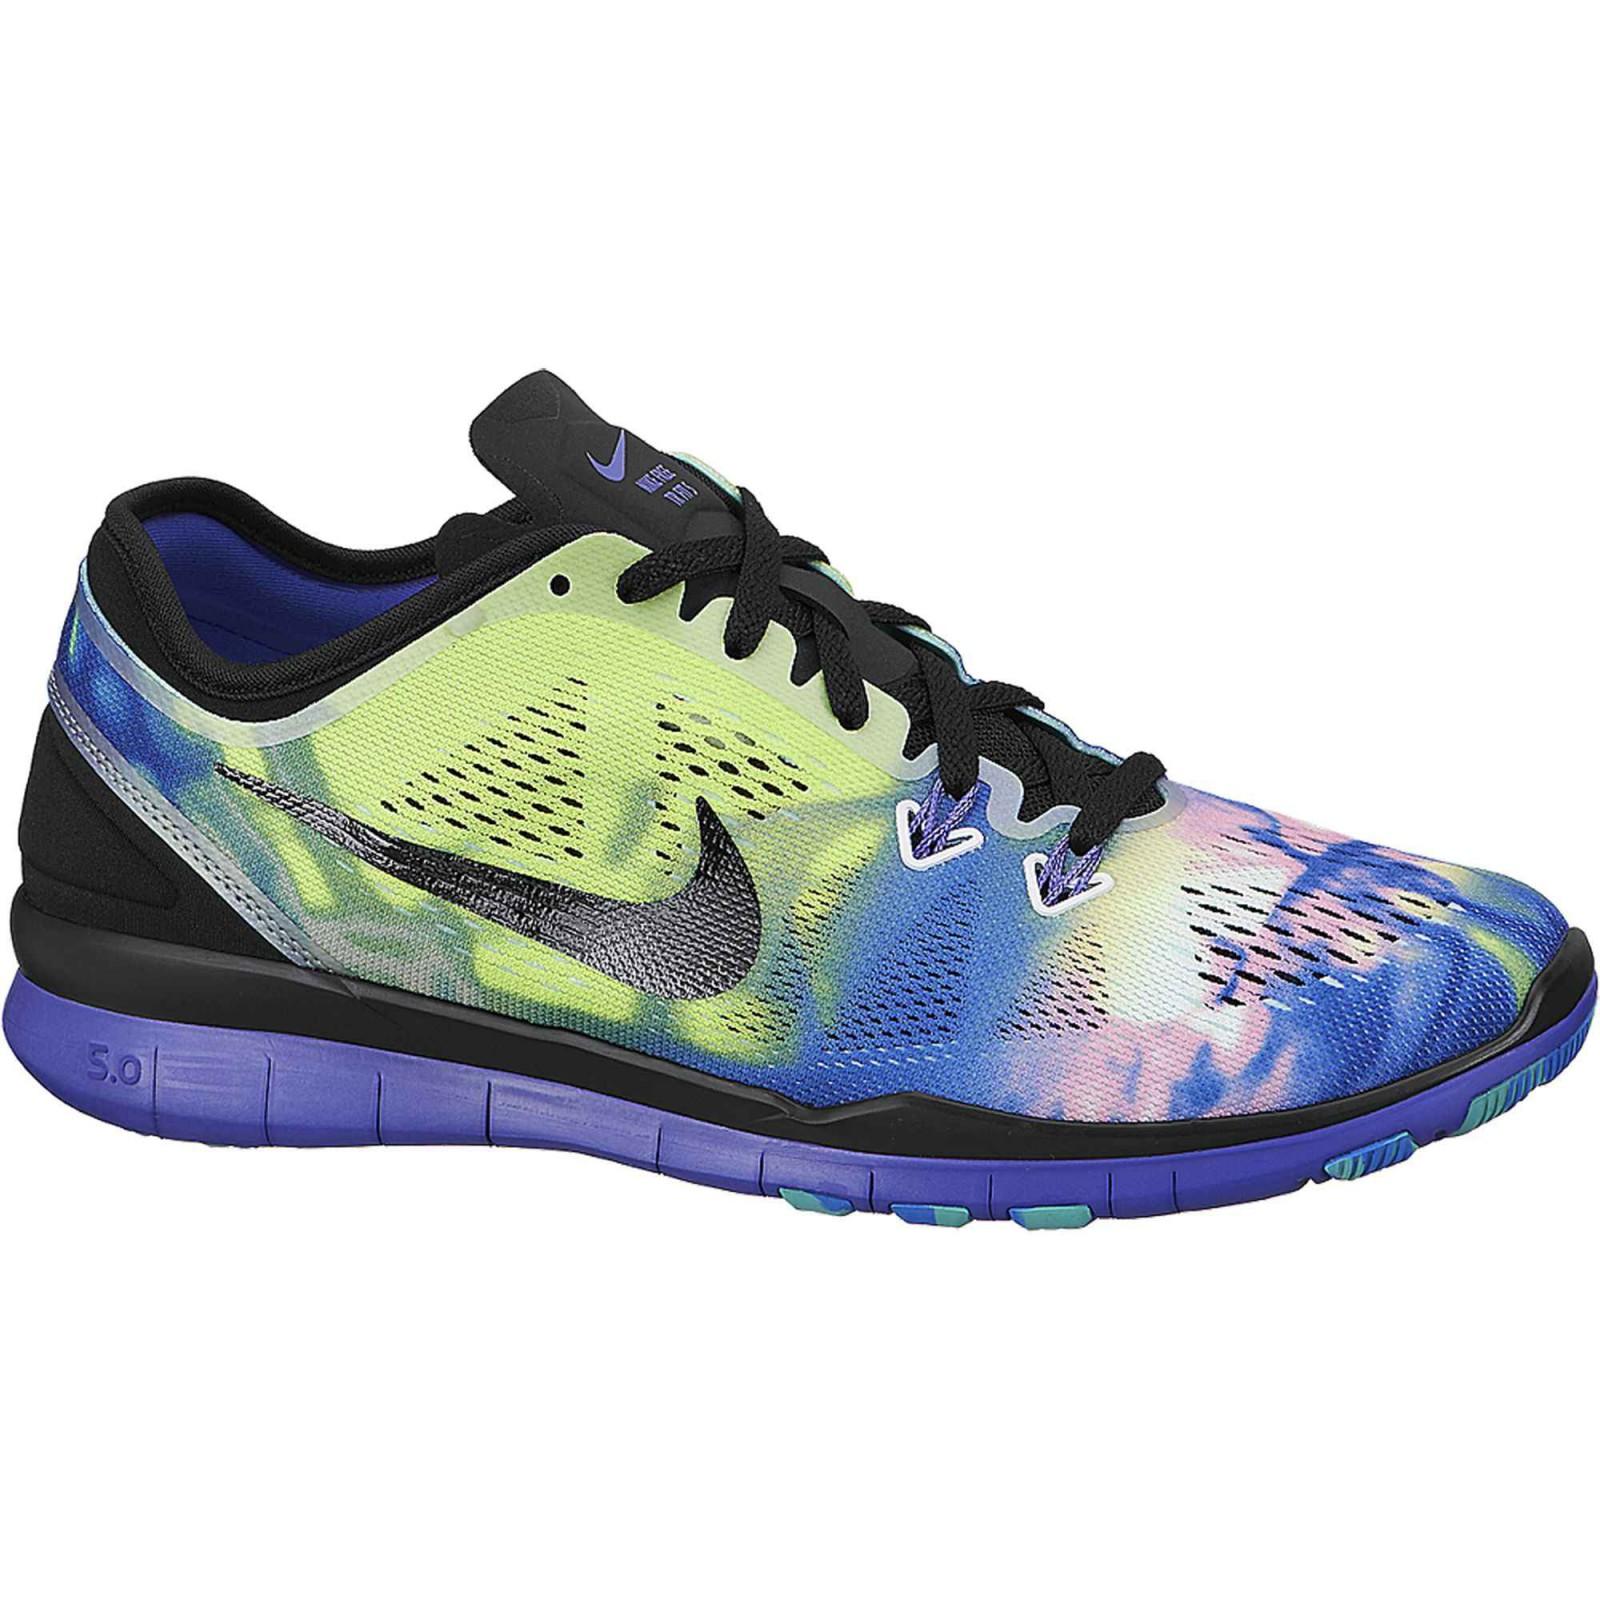 Dámská fitness obuv Nike WMNS NKE FREE 5.0 TR FIT 5 PRT  148d2c7647